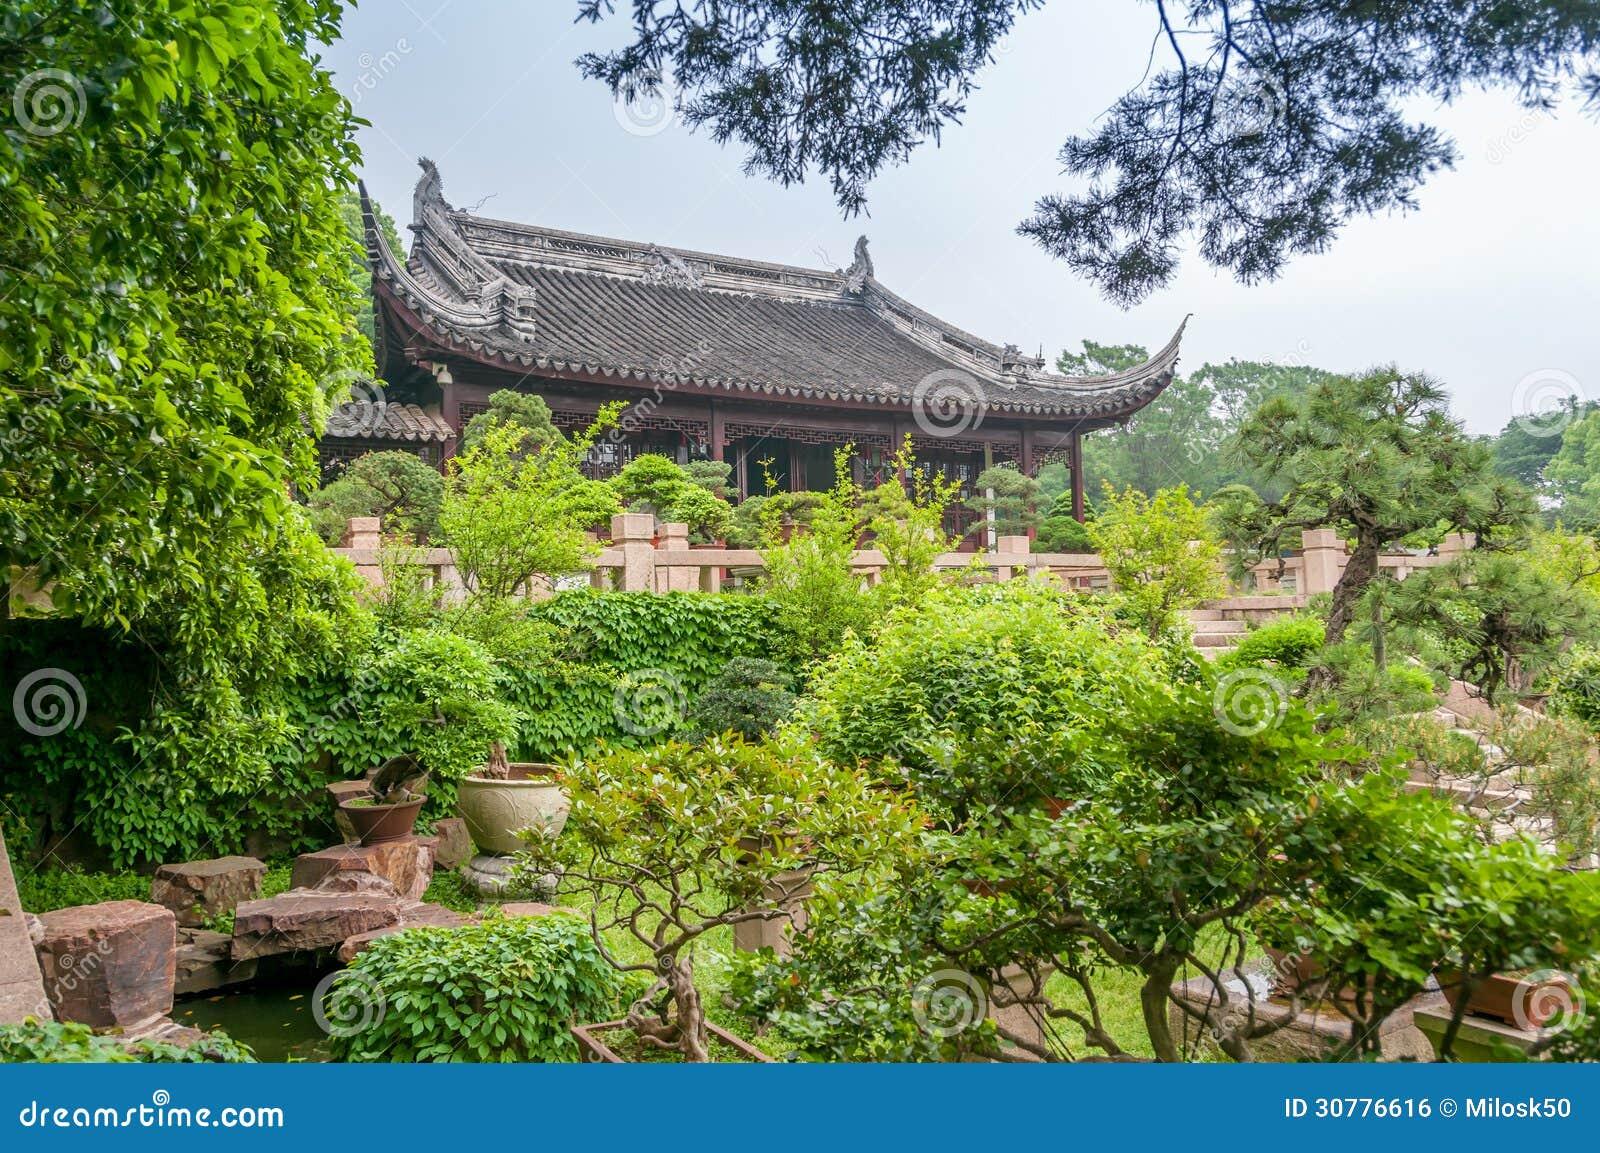 Botanical Garden Royalty Free Stock Image Image 30776616